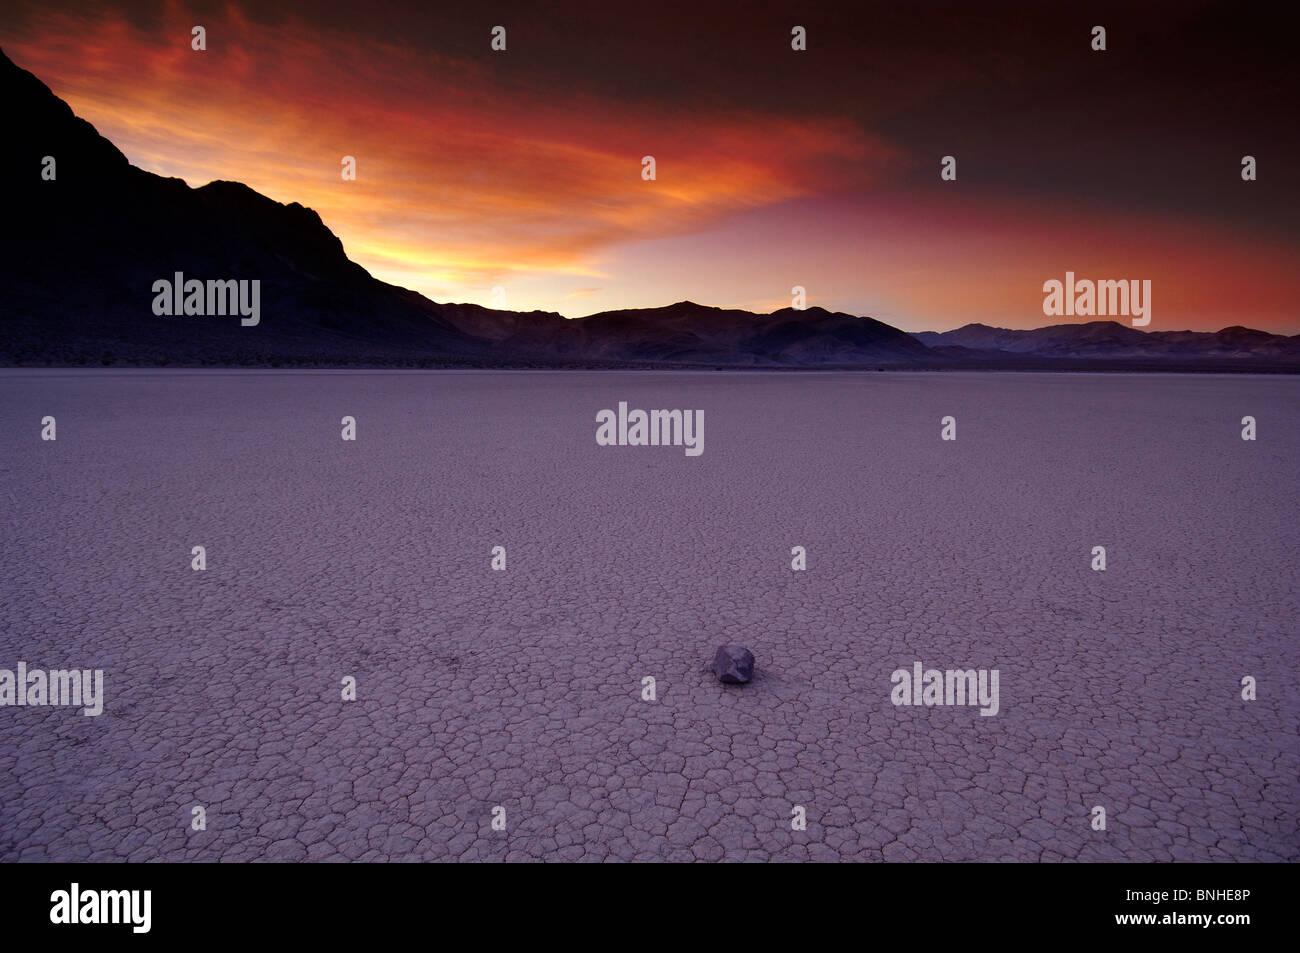 USA-California-Rennstrecke bei Dämmerung Death Valley Nationalpark Segeln Stein trocken Seenlandschaft Landschaft Stockbild